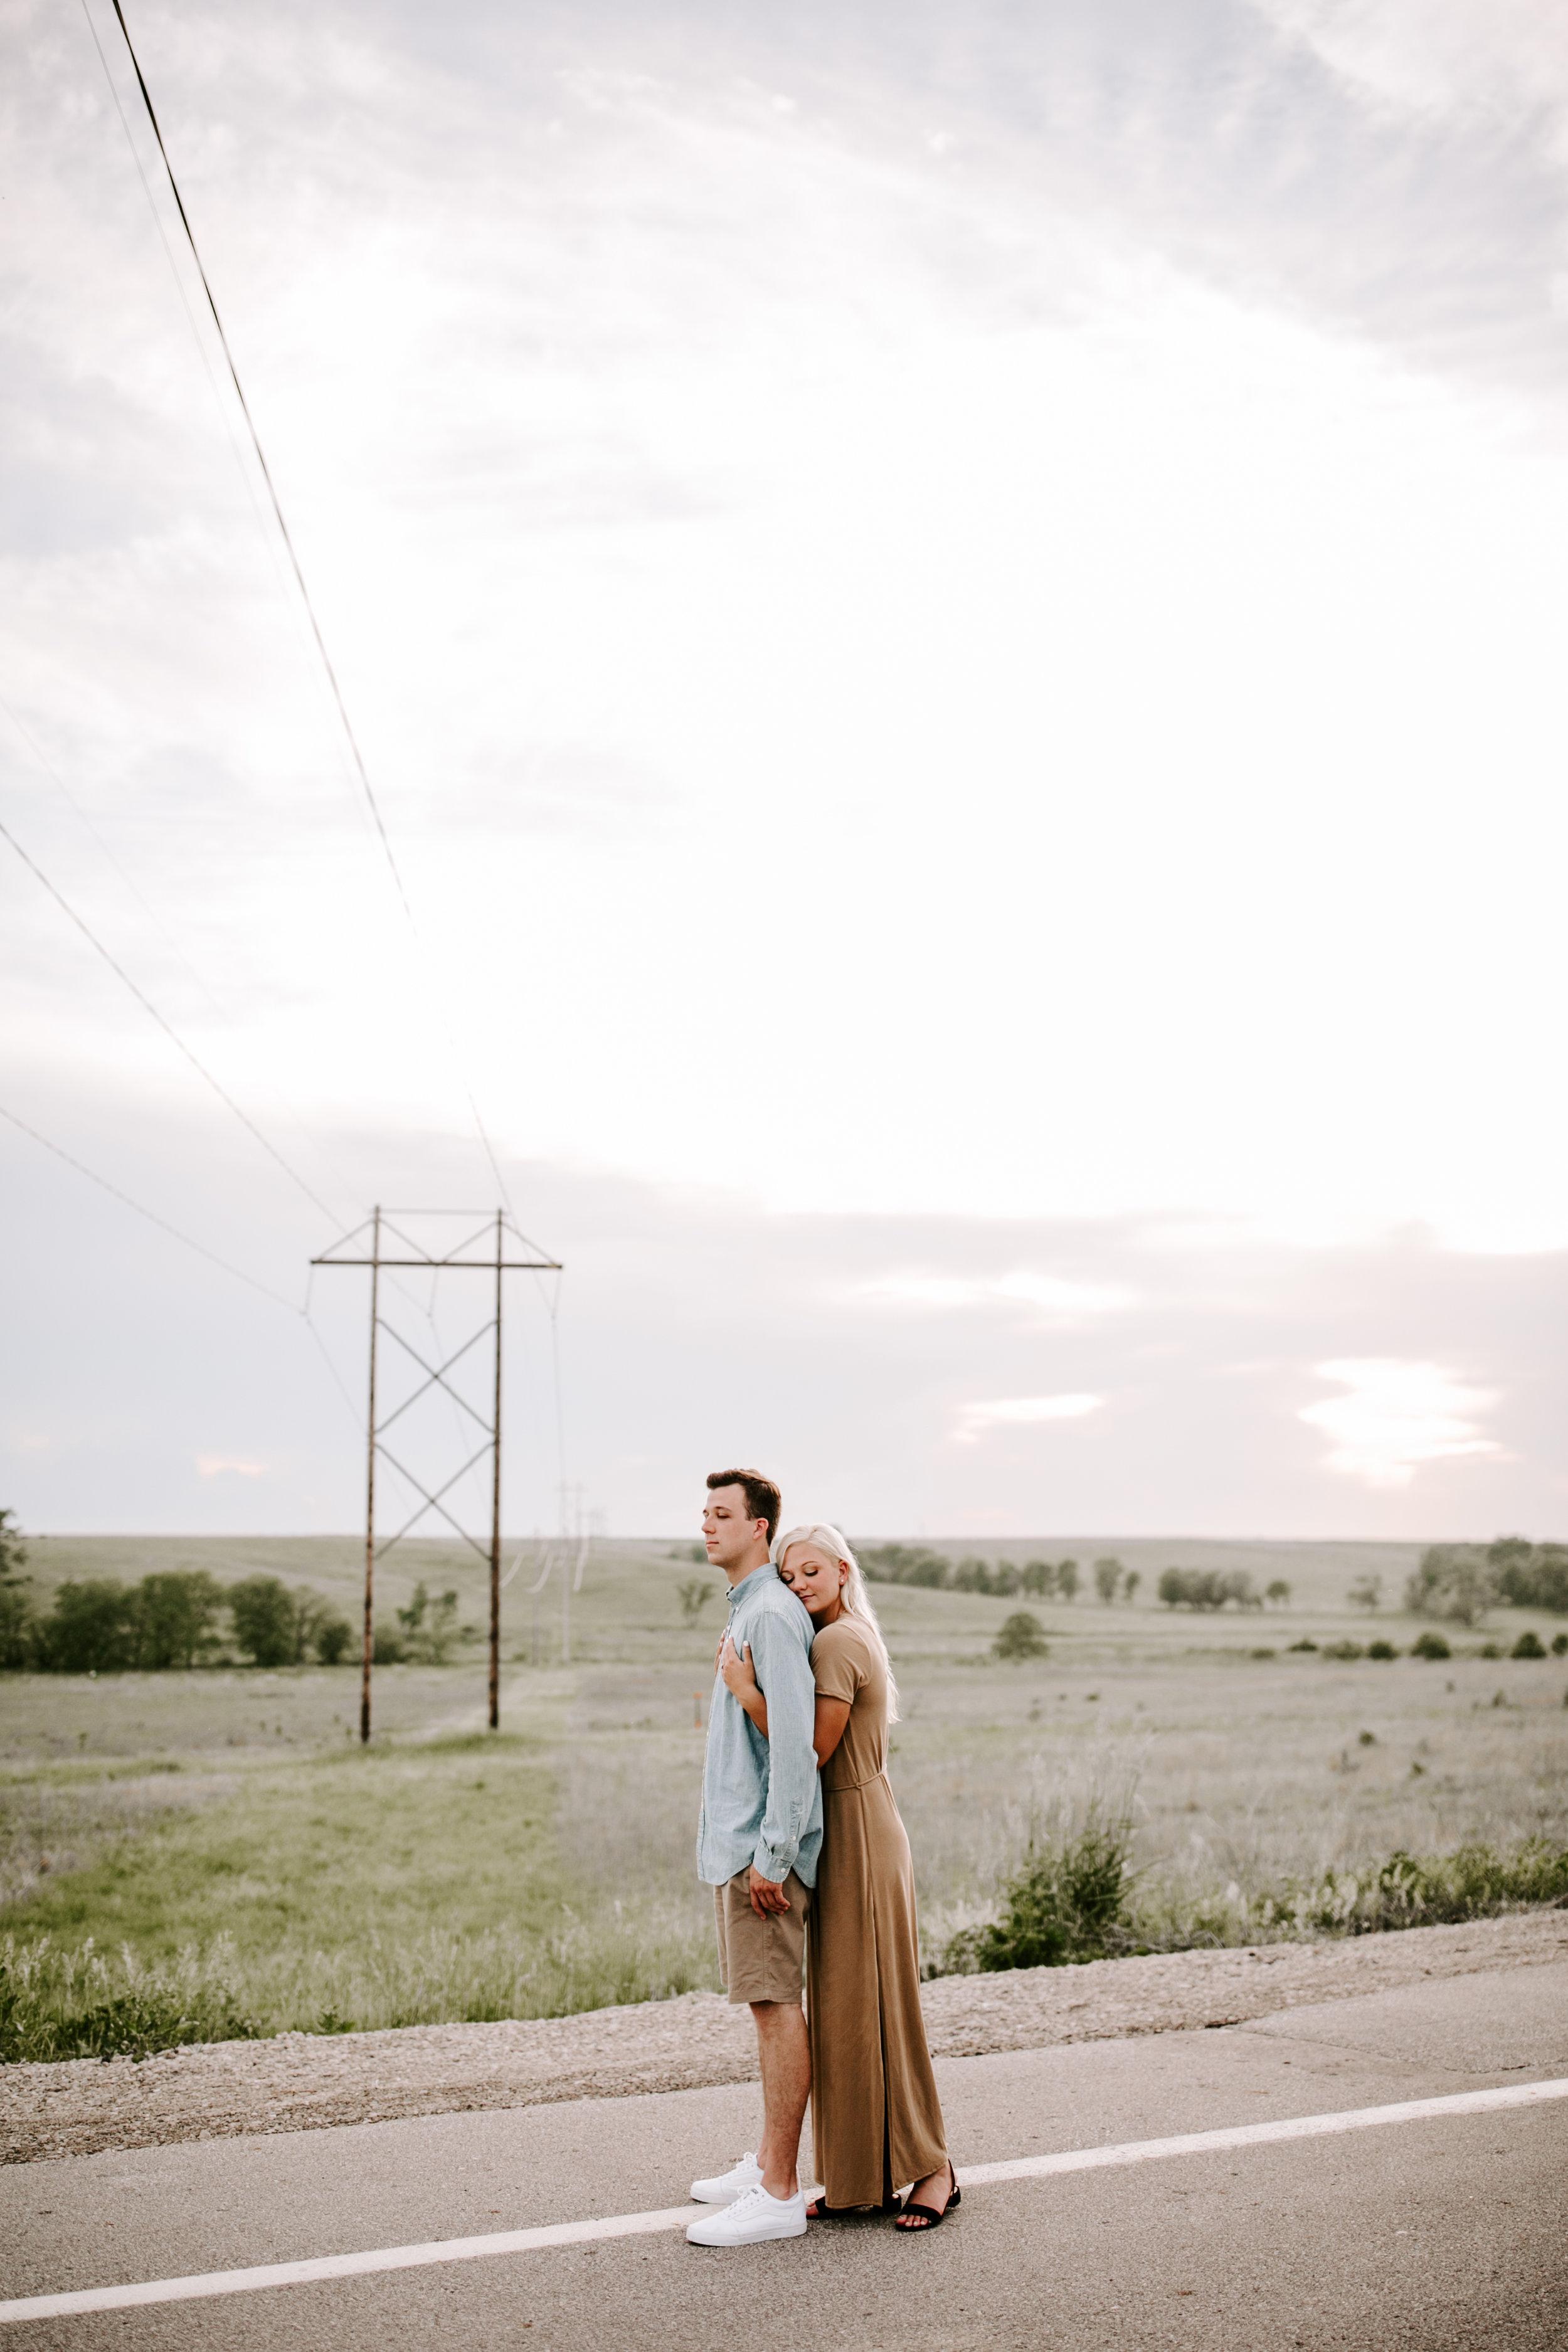 gracetphotography-adventure-session-des-moines-iowa-wedding-photographer-26.jpg